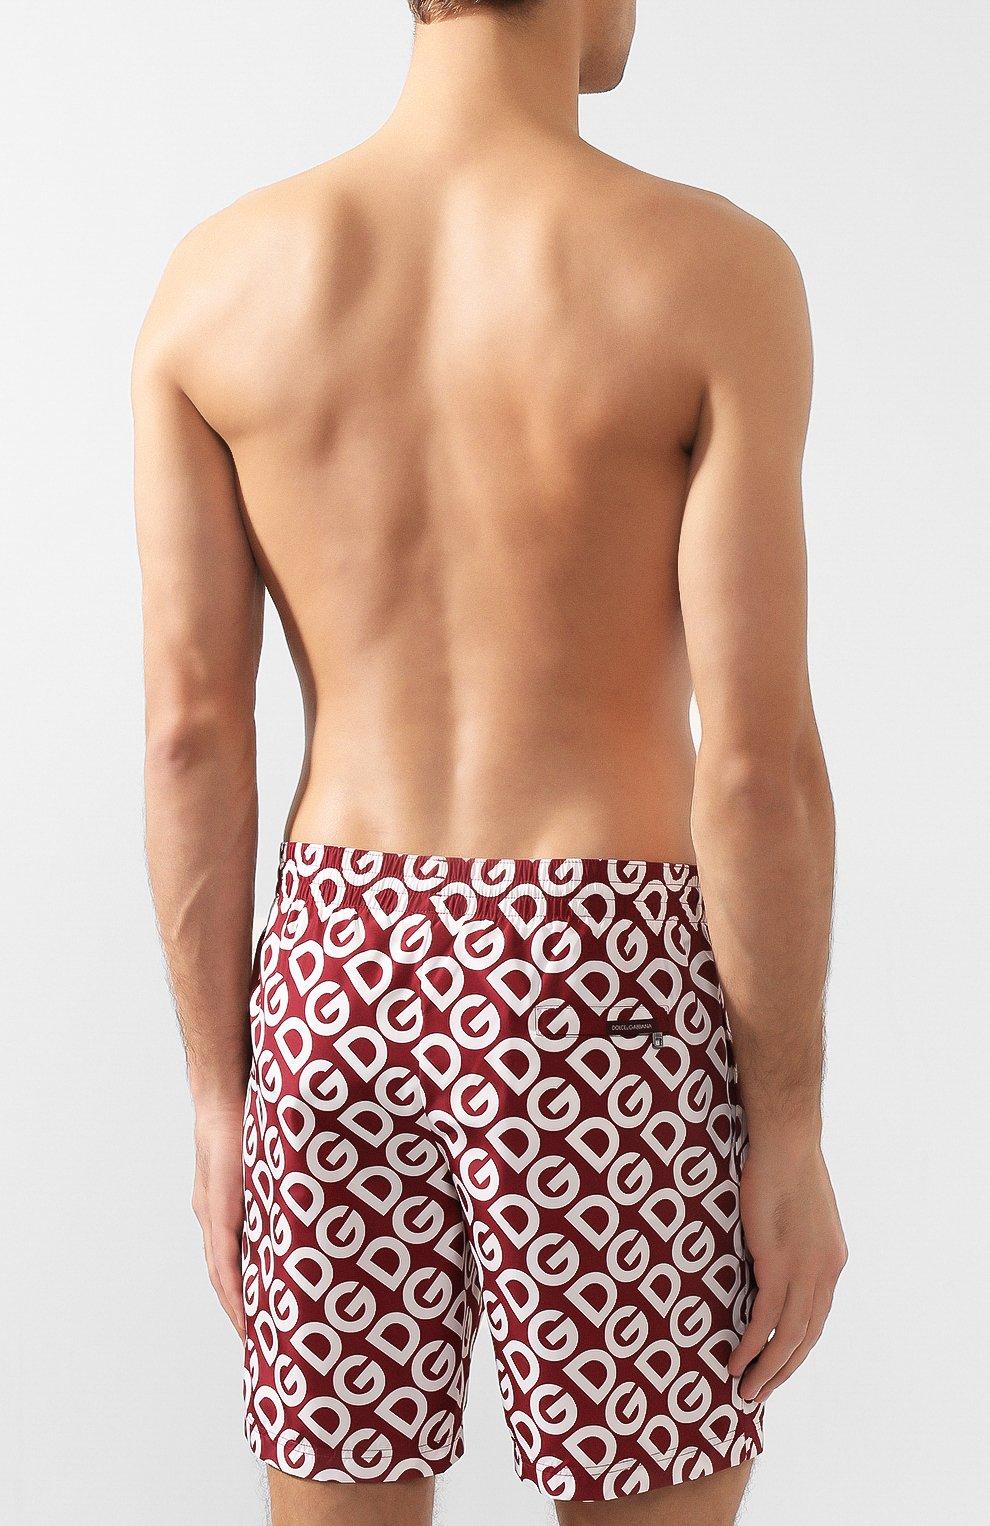 Плавки-шорты | Фото №4